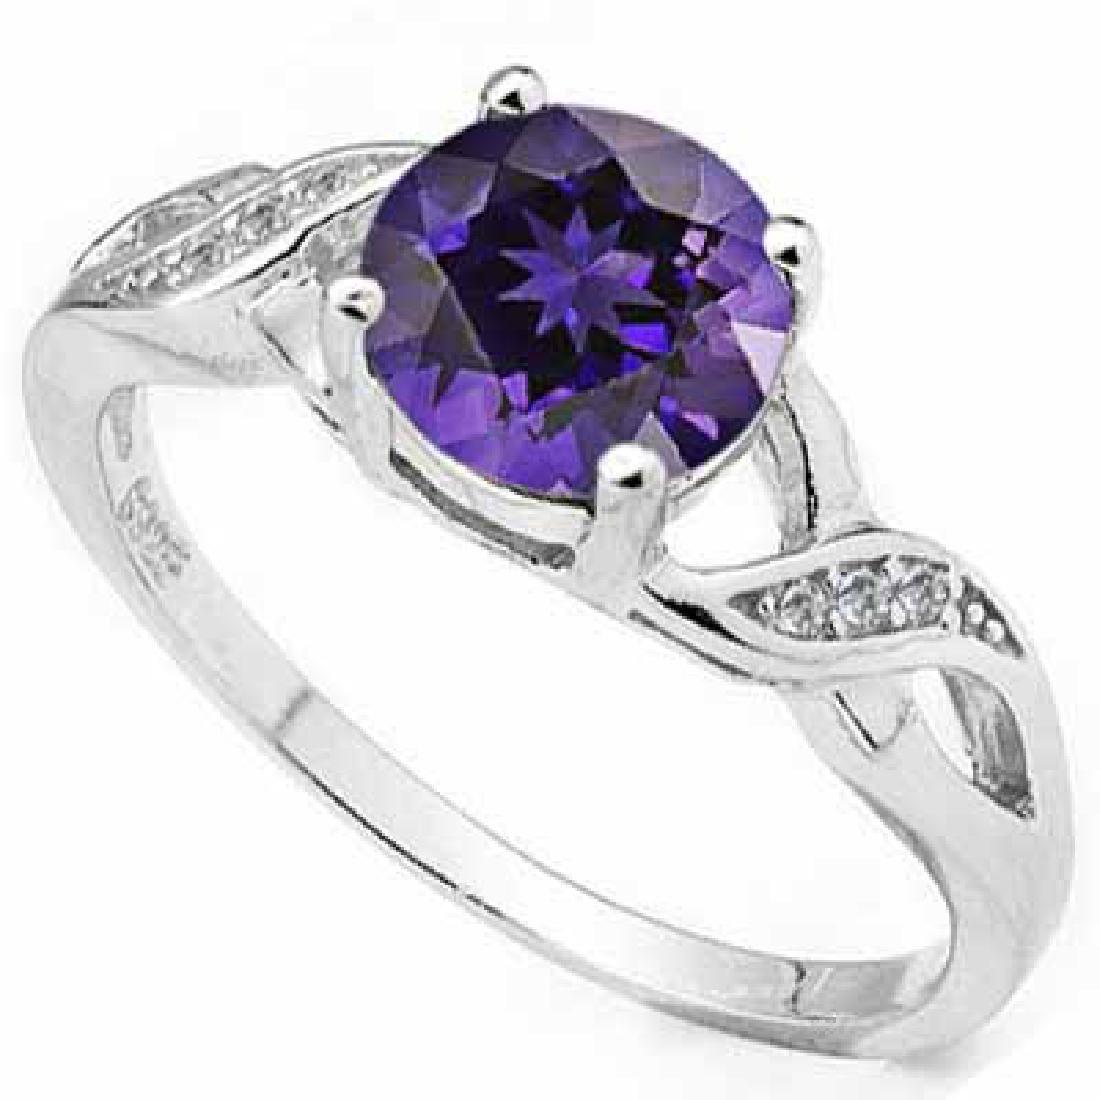 1 1/5 CARAT AMETHYST & (6 PCS) FLAWLESS CREATED DIAMOND